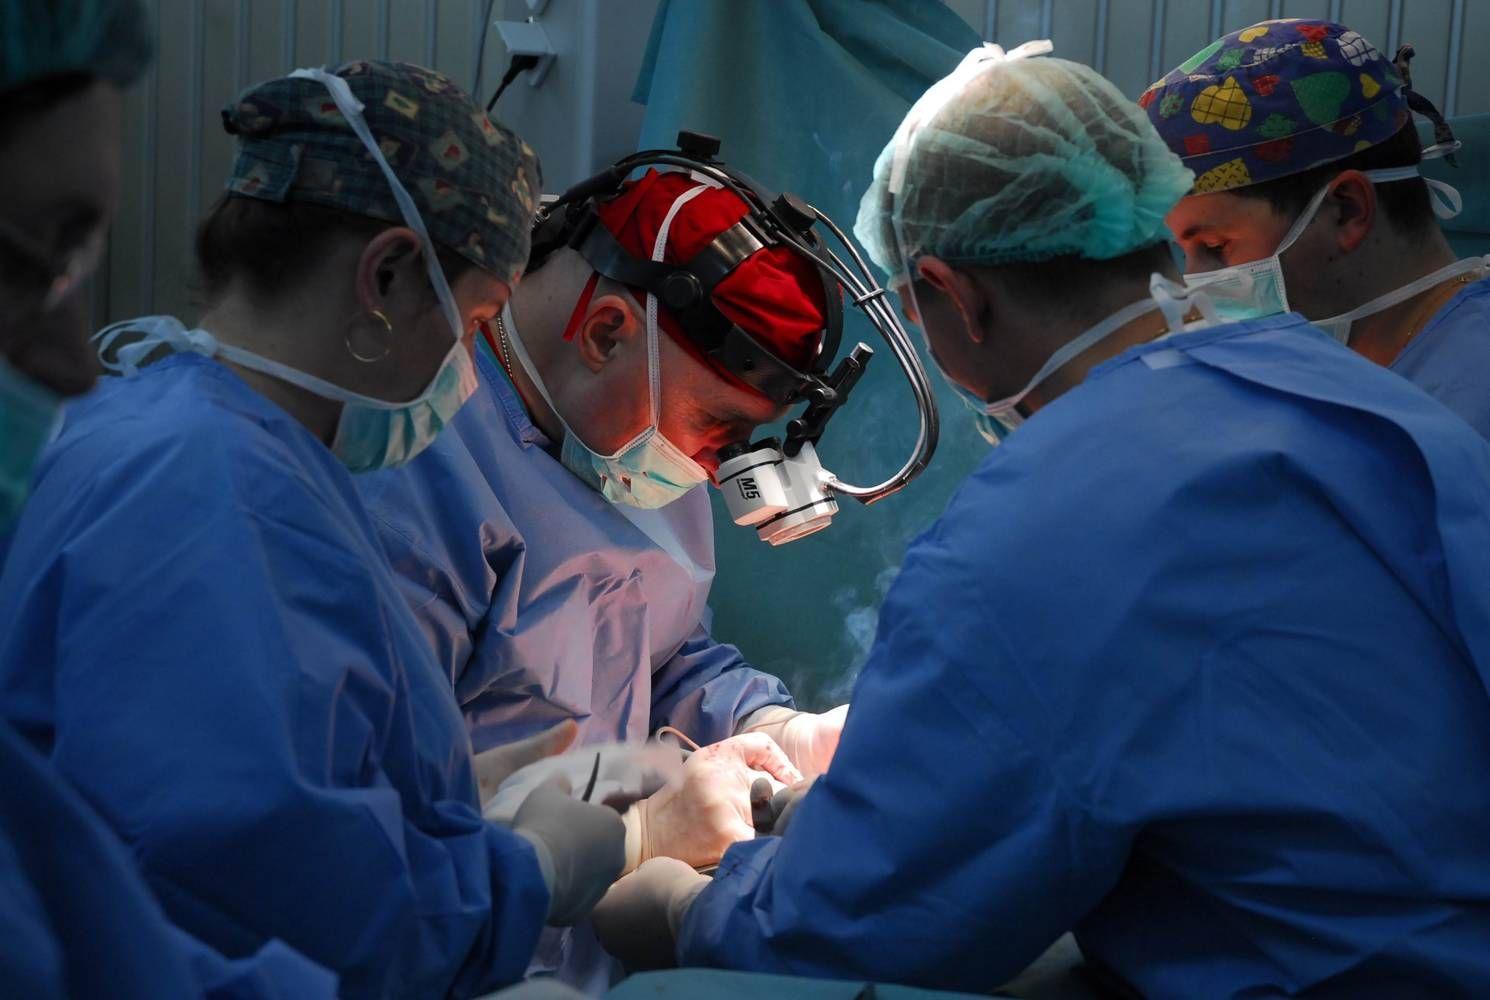 Foto: Incredibil! Transplant de şase organe